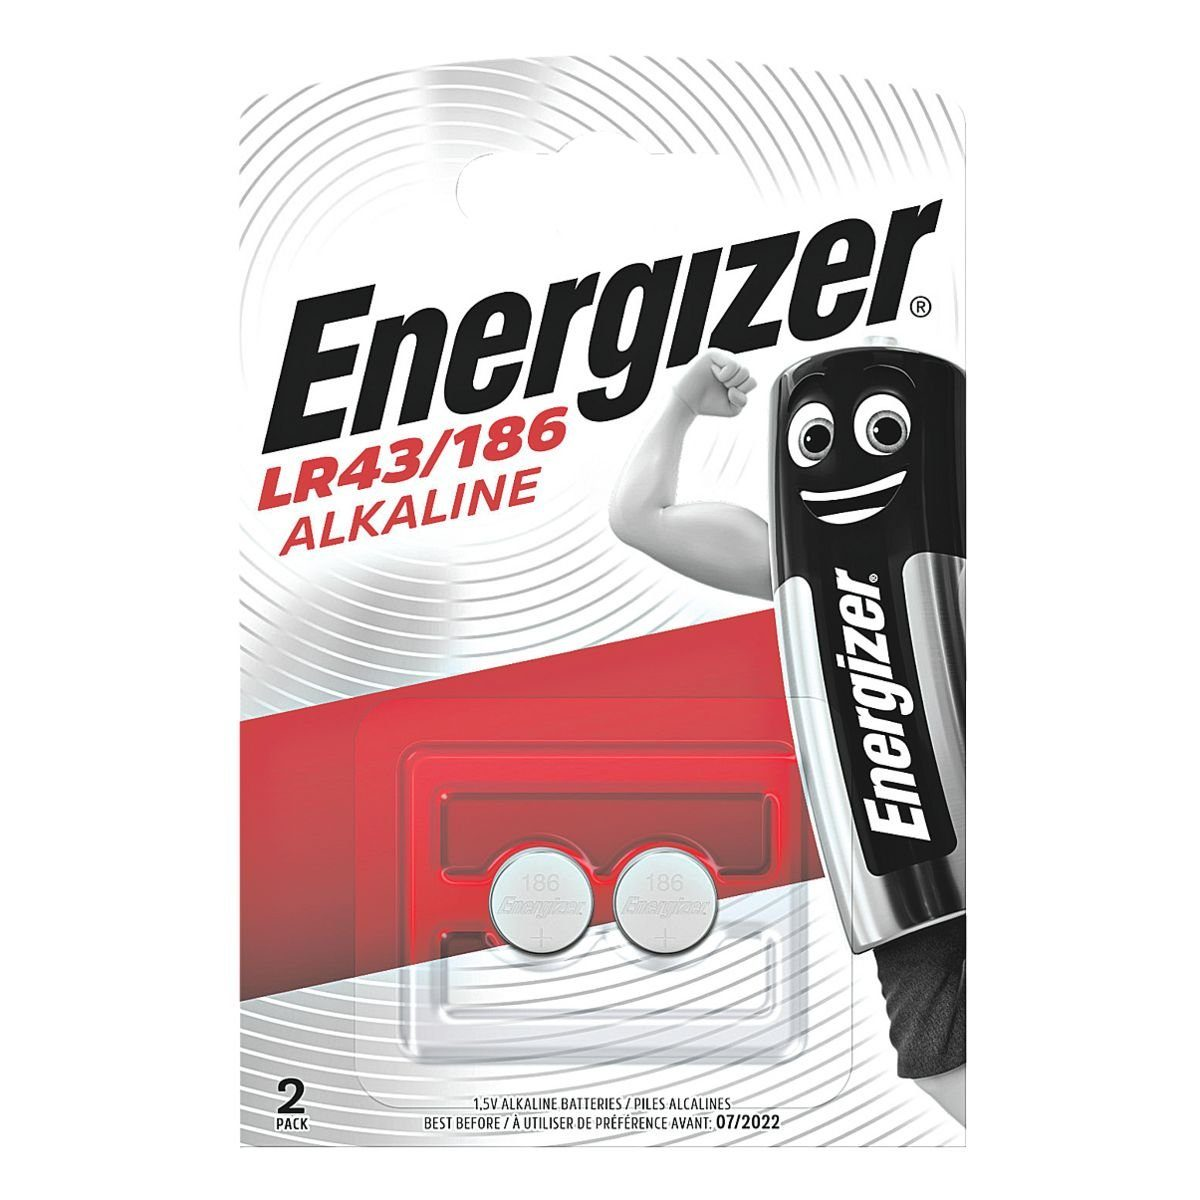 Energizer Knopfzelle 186 / LR43 »Spezial Alkali«